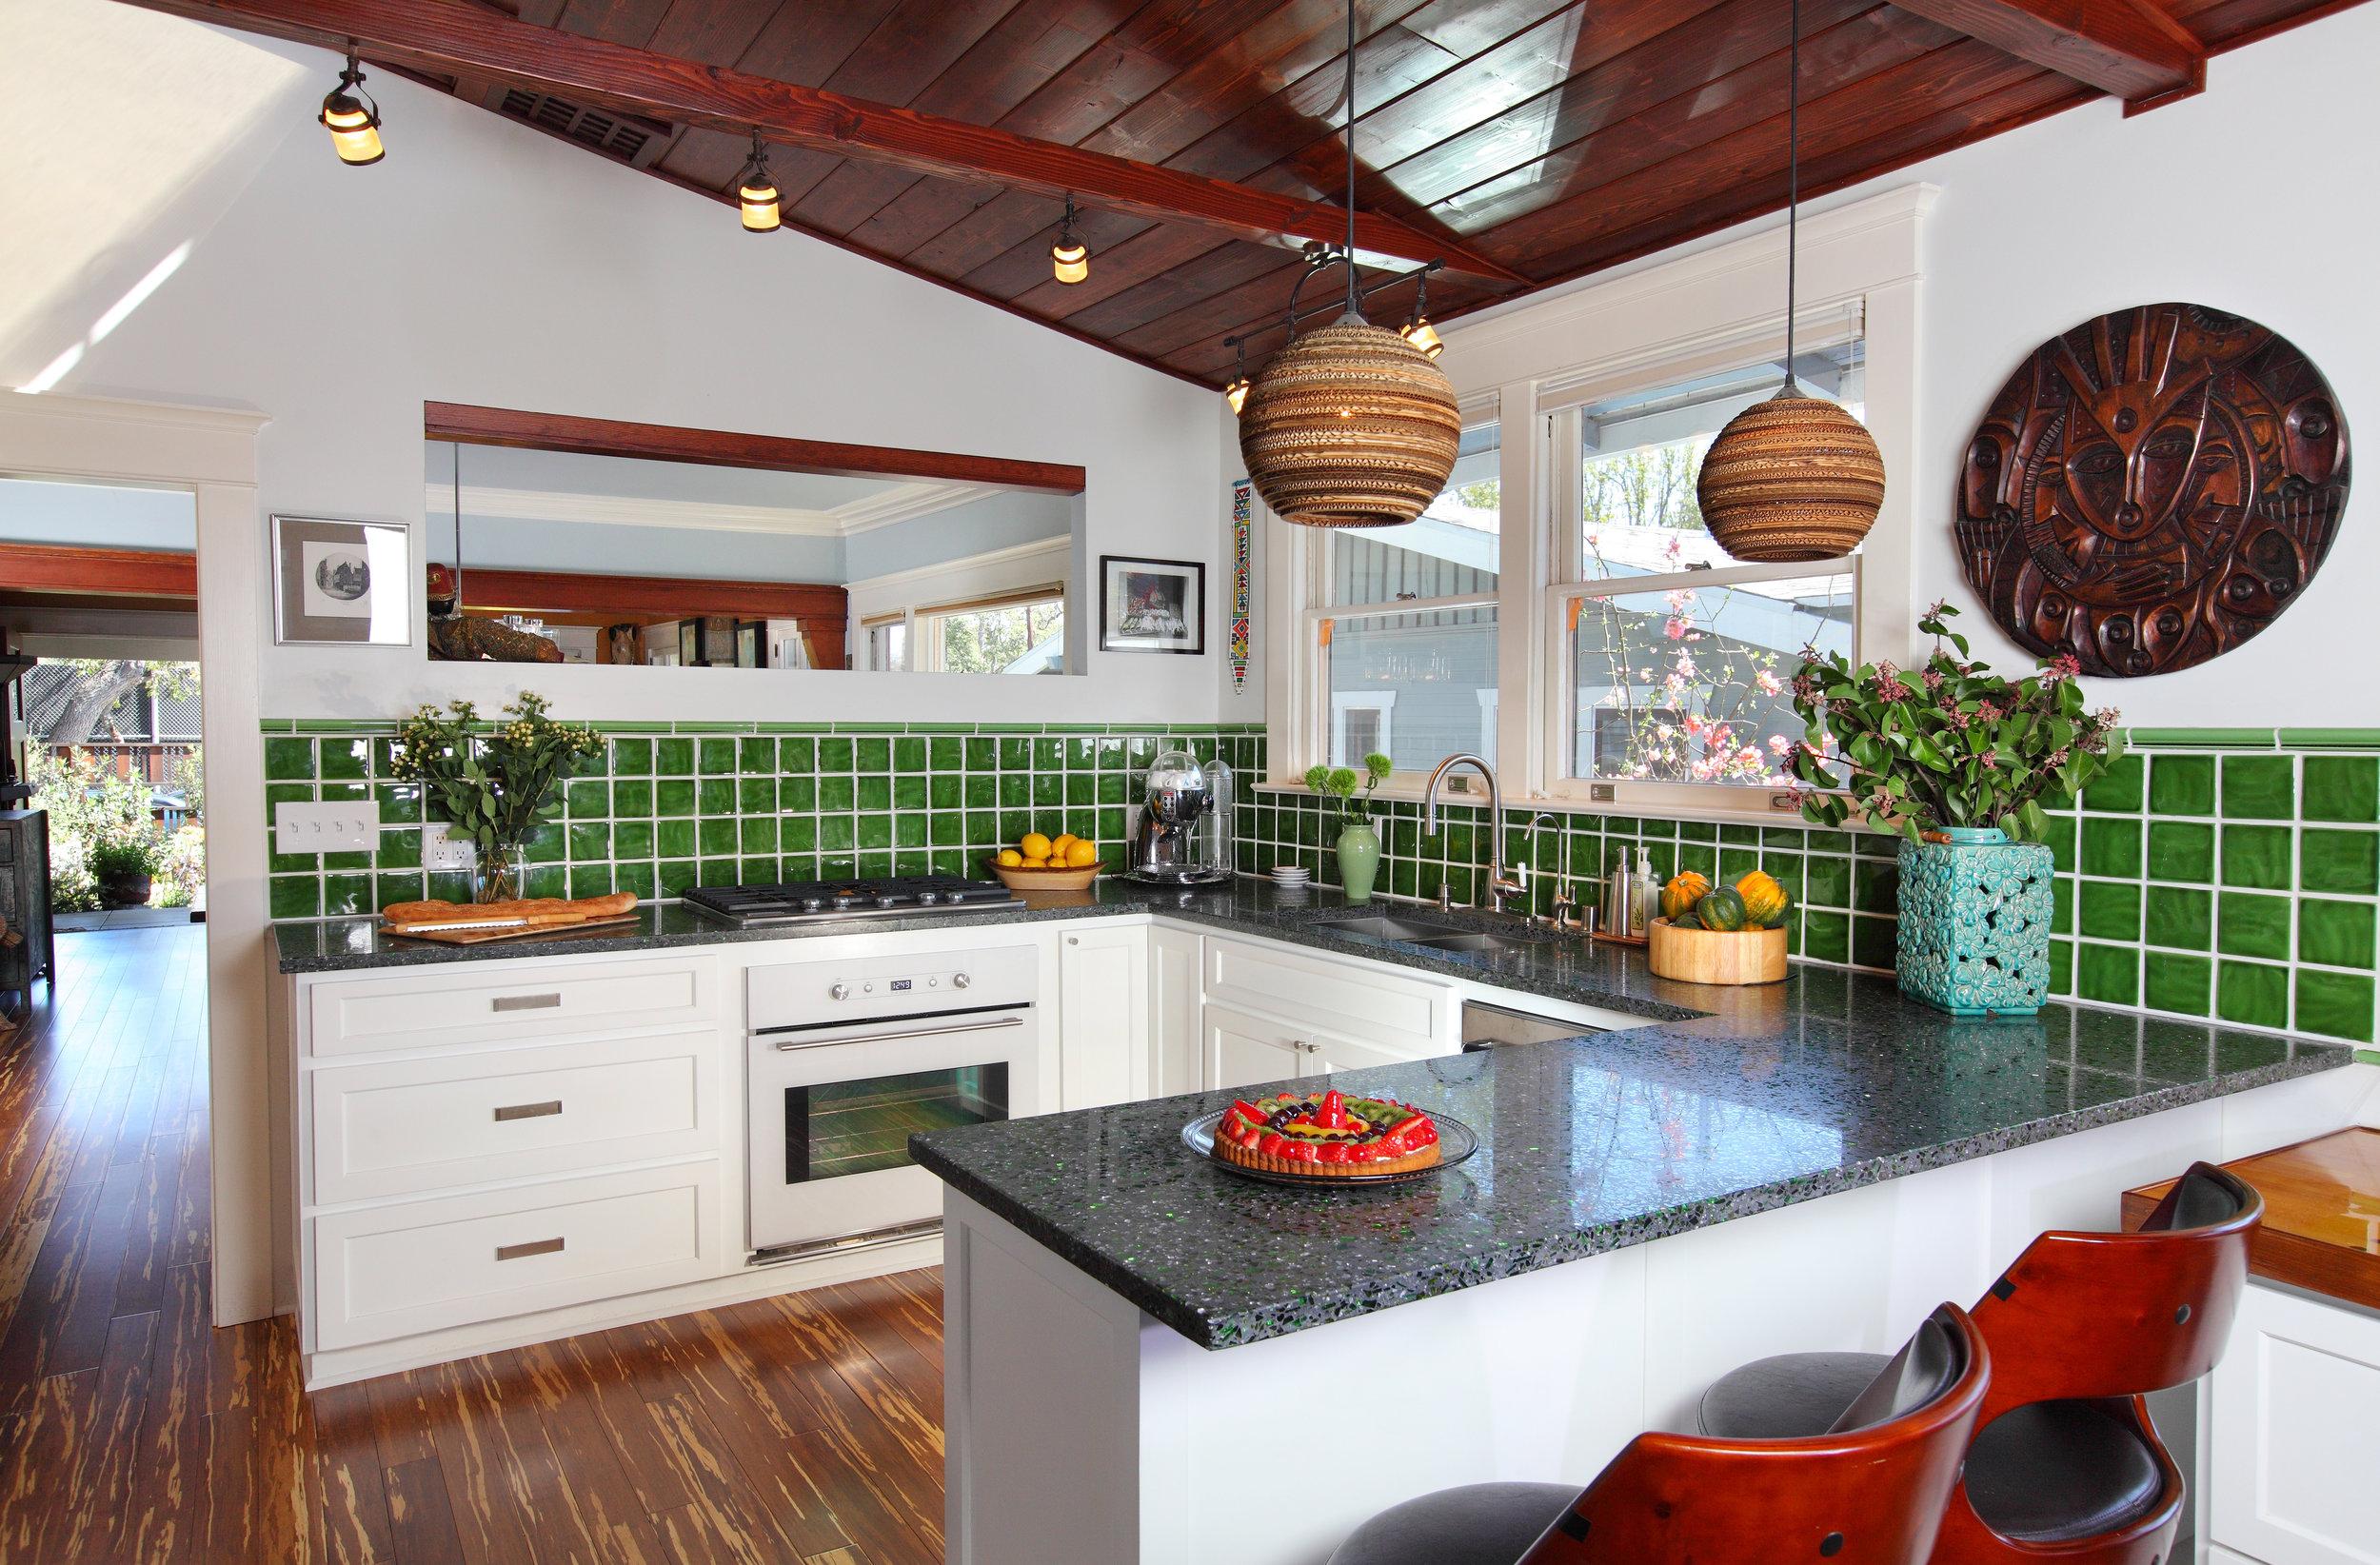 Sarah-barnard-design-modern-recycled-kitchen.jpg